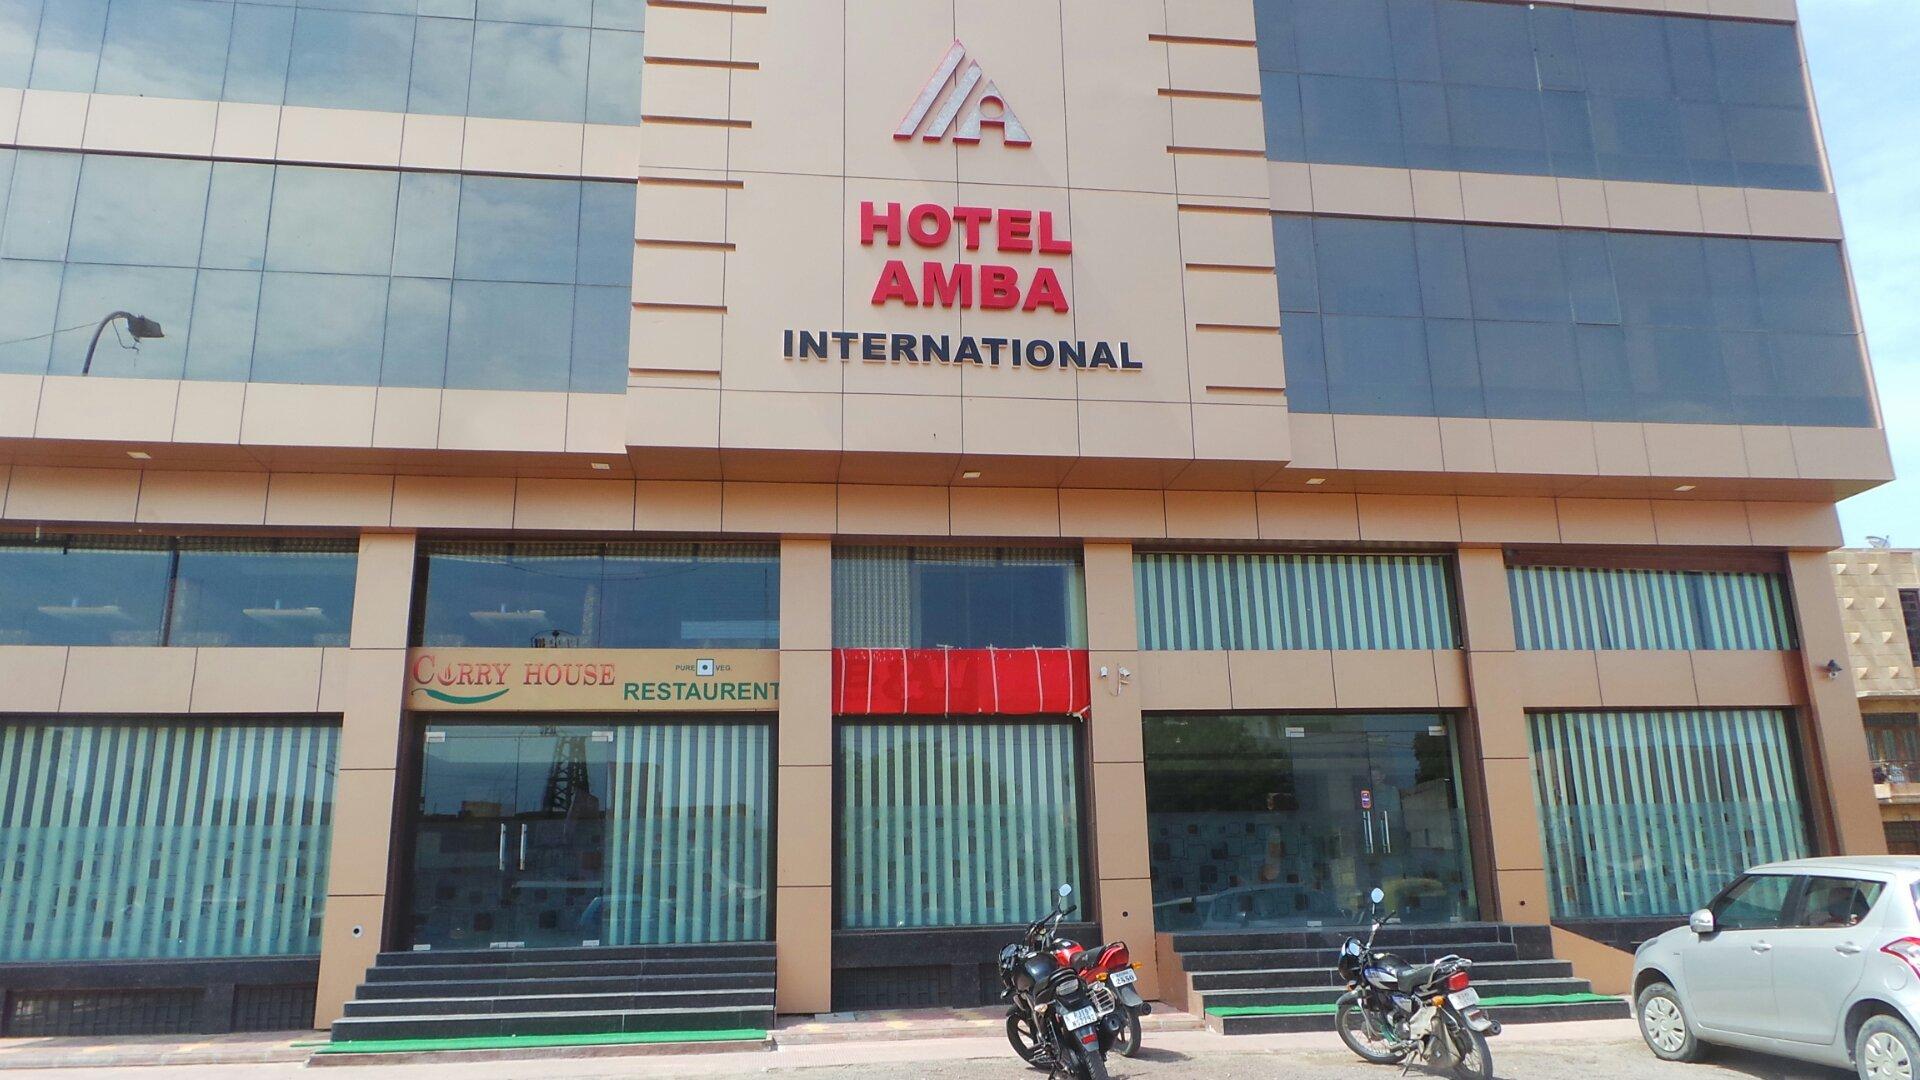 Hotel Amba International in Jodhpur